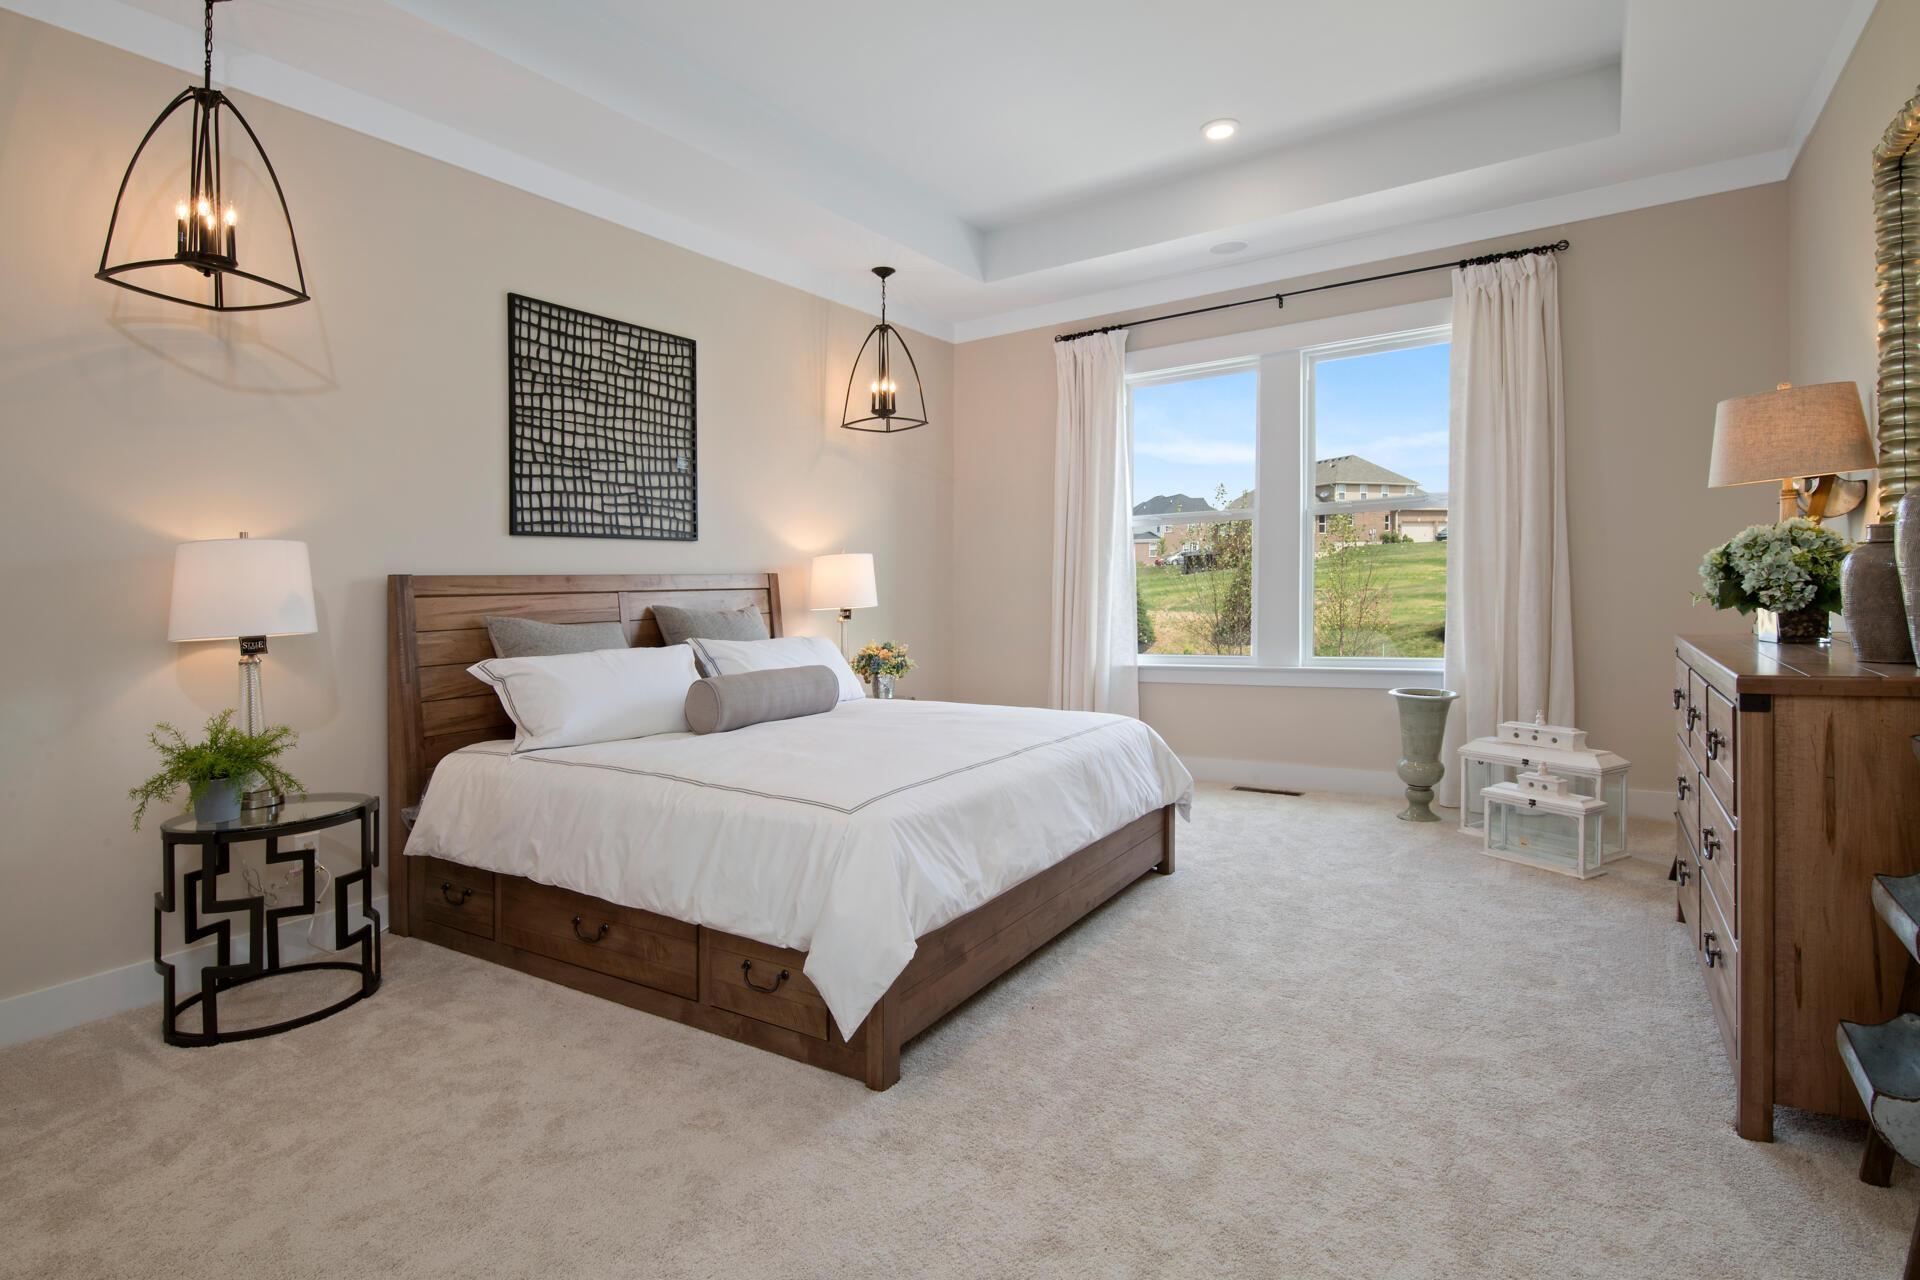 Bedroom featured in the Lyndhurst By Drees Homes in Cincinnati, OH